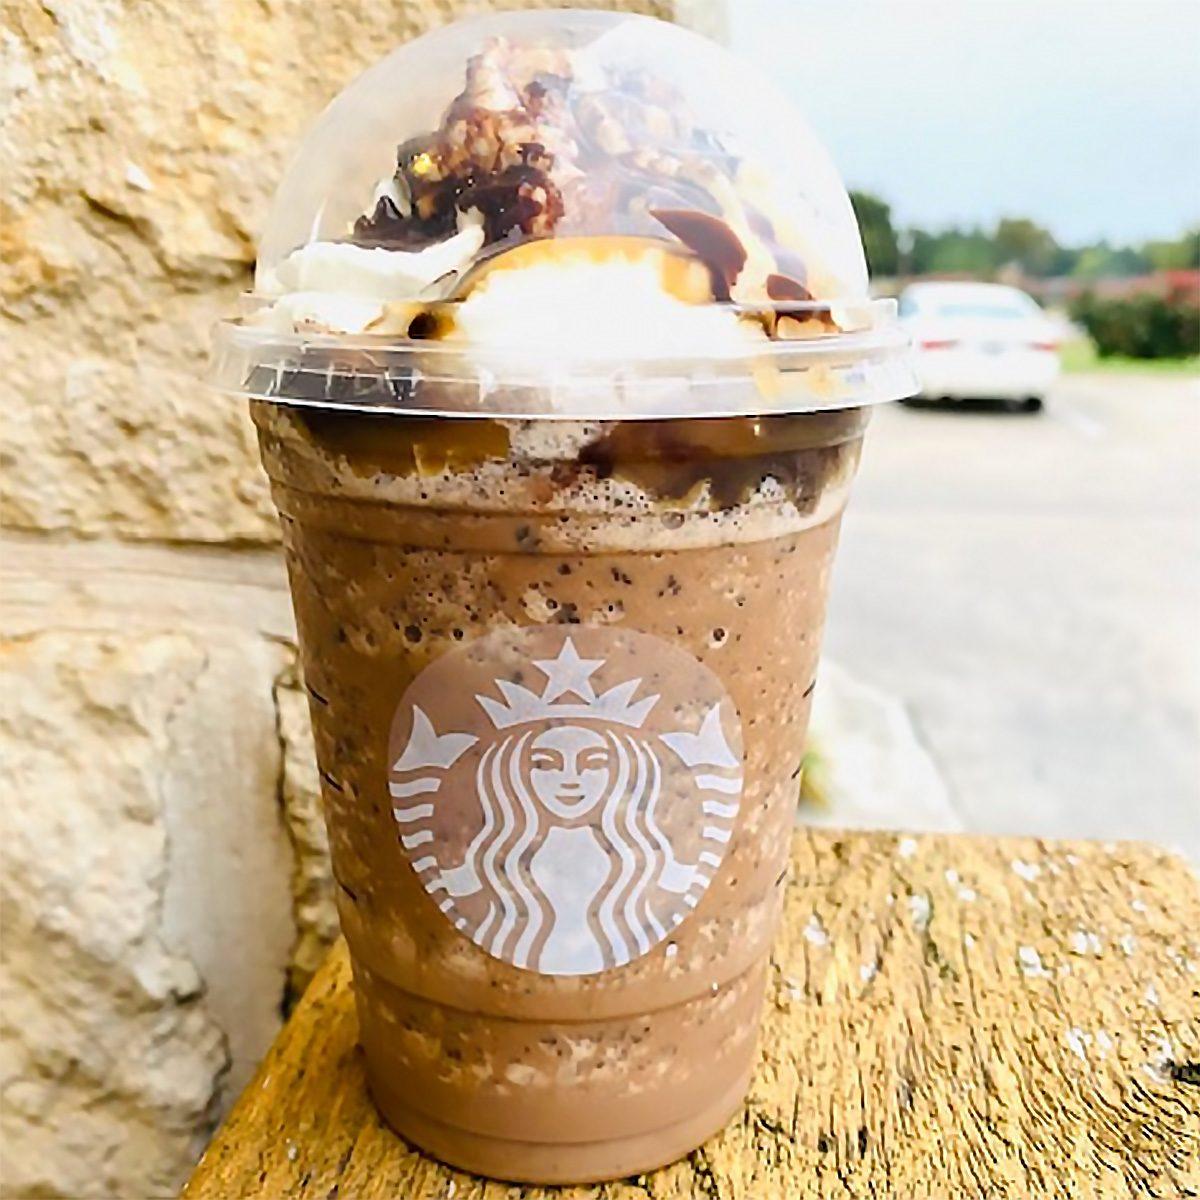 RARE Starbucks Caramel Brulee Sugar Straw Caramel Ribbon Crunch Iced Coffee